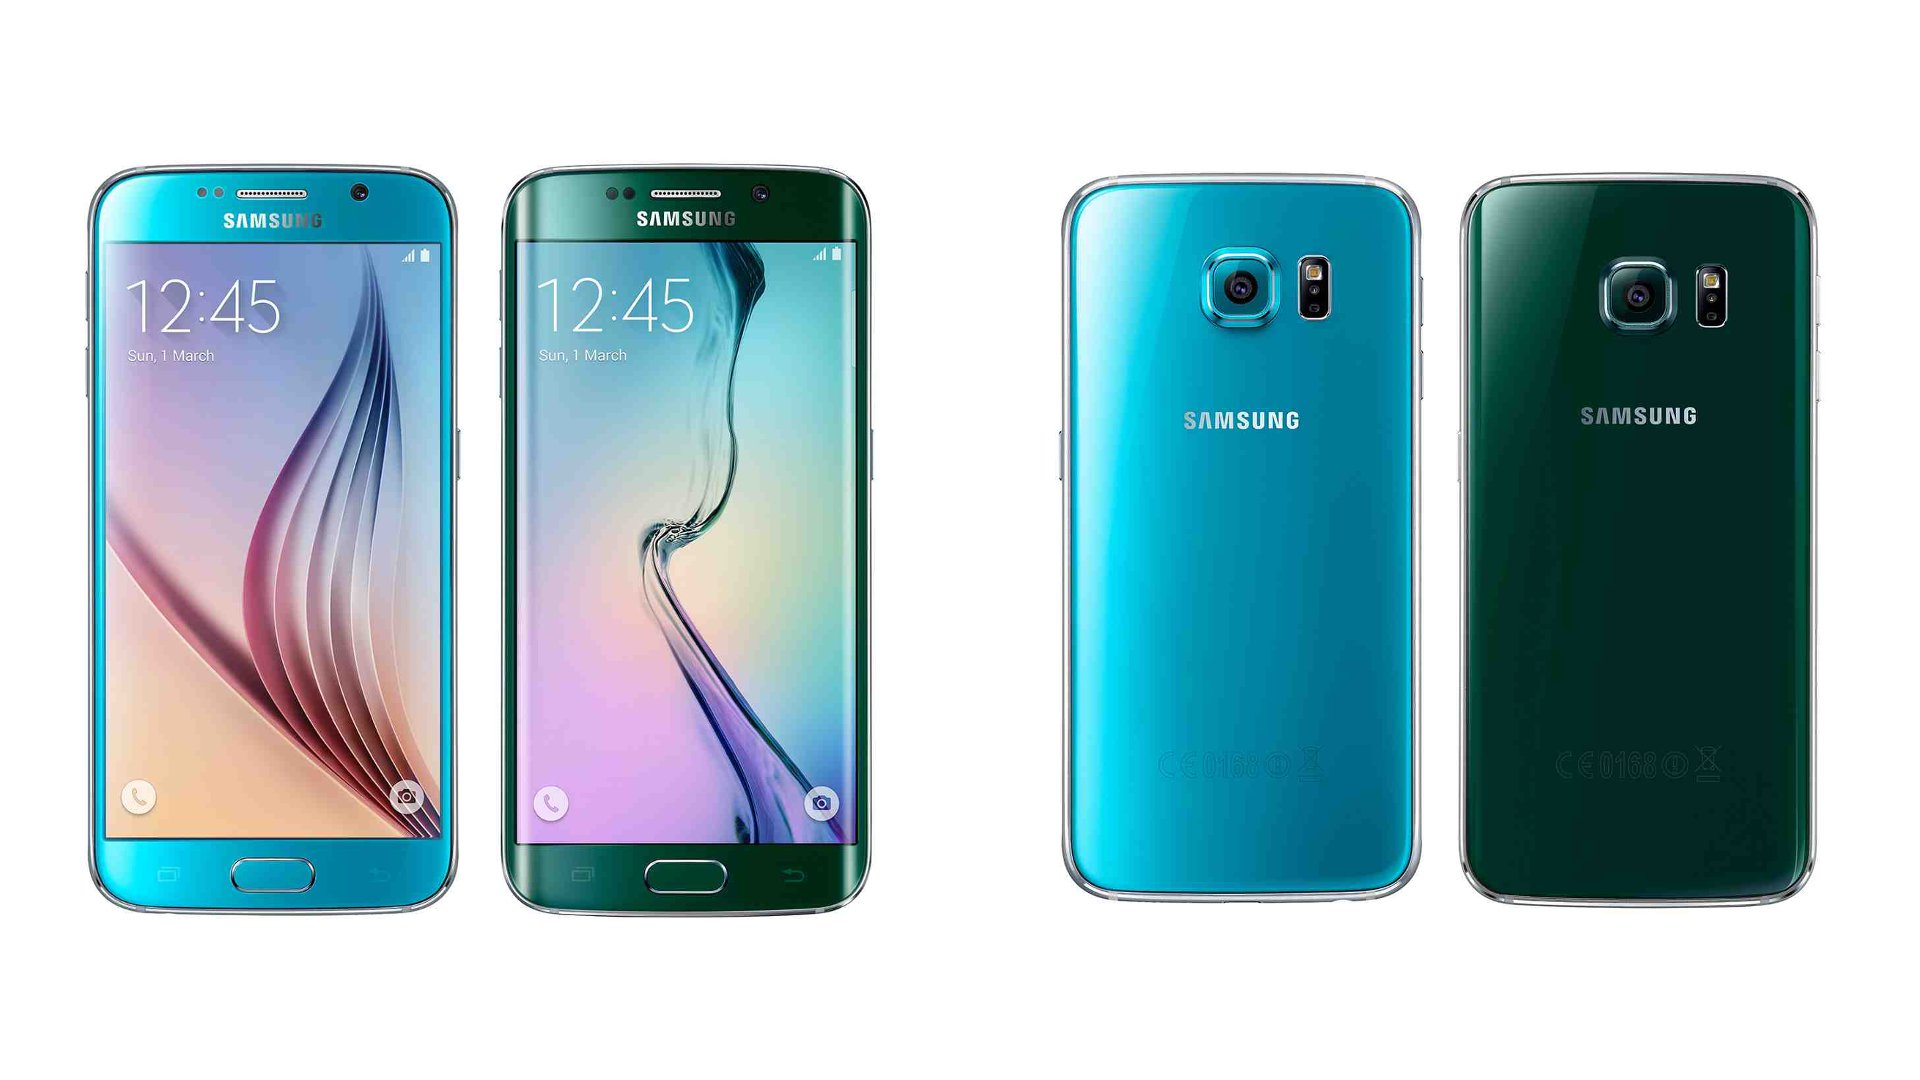 Blue Topaz Galaxy S6 and Green Emerald Galaxy S6 Edge